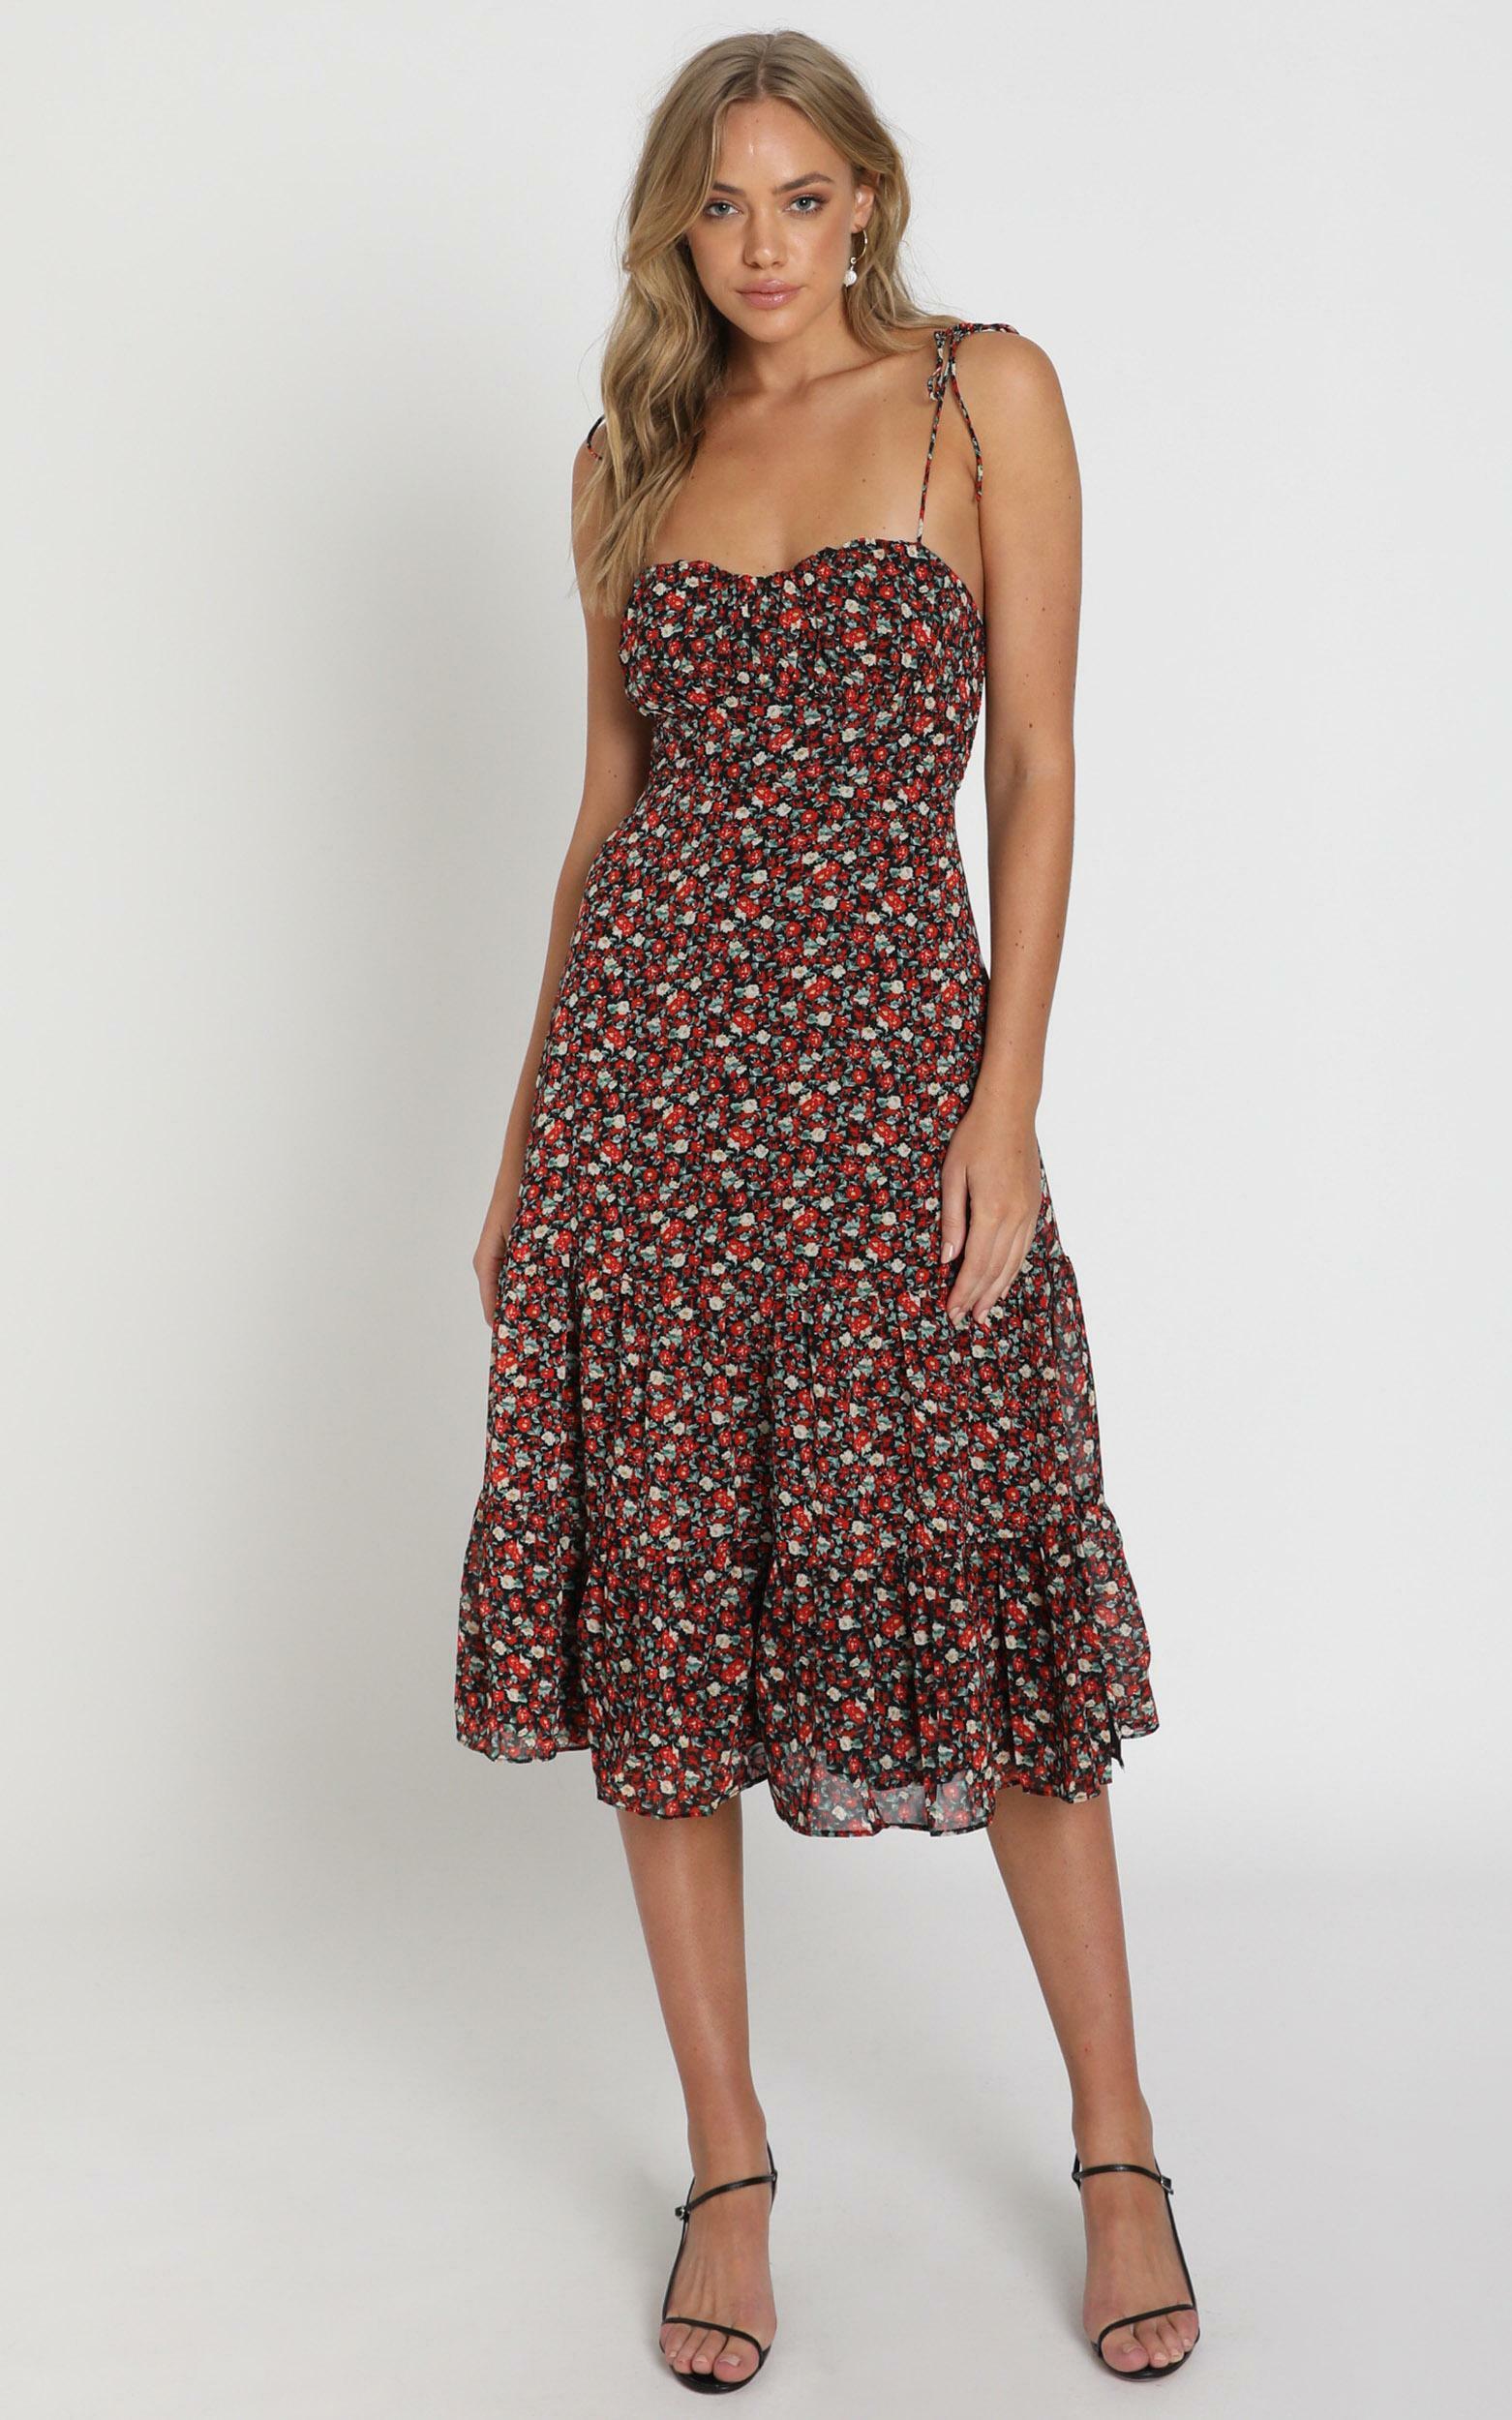 Monaco Dress in black floral - 20 (XXXXL), Black, hi-res image number null